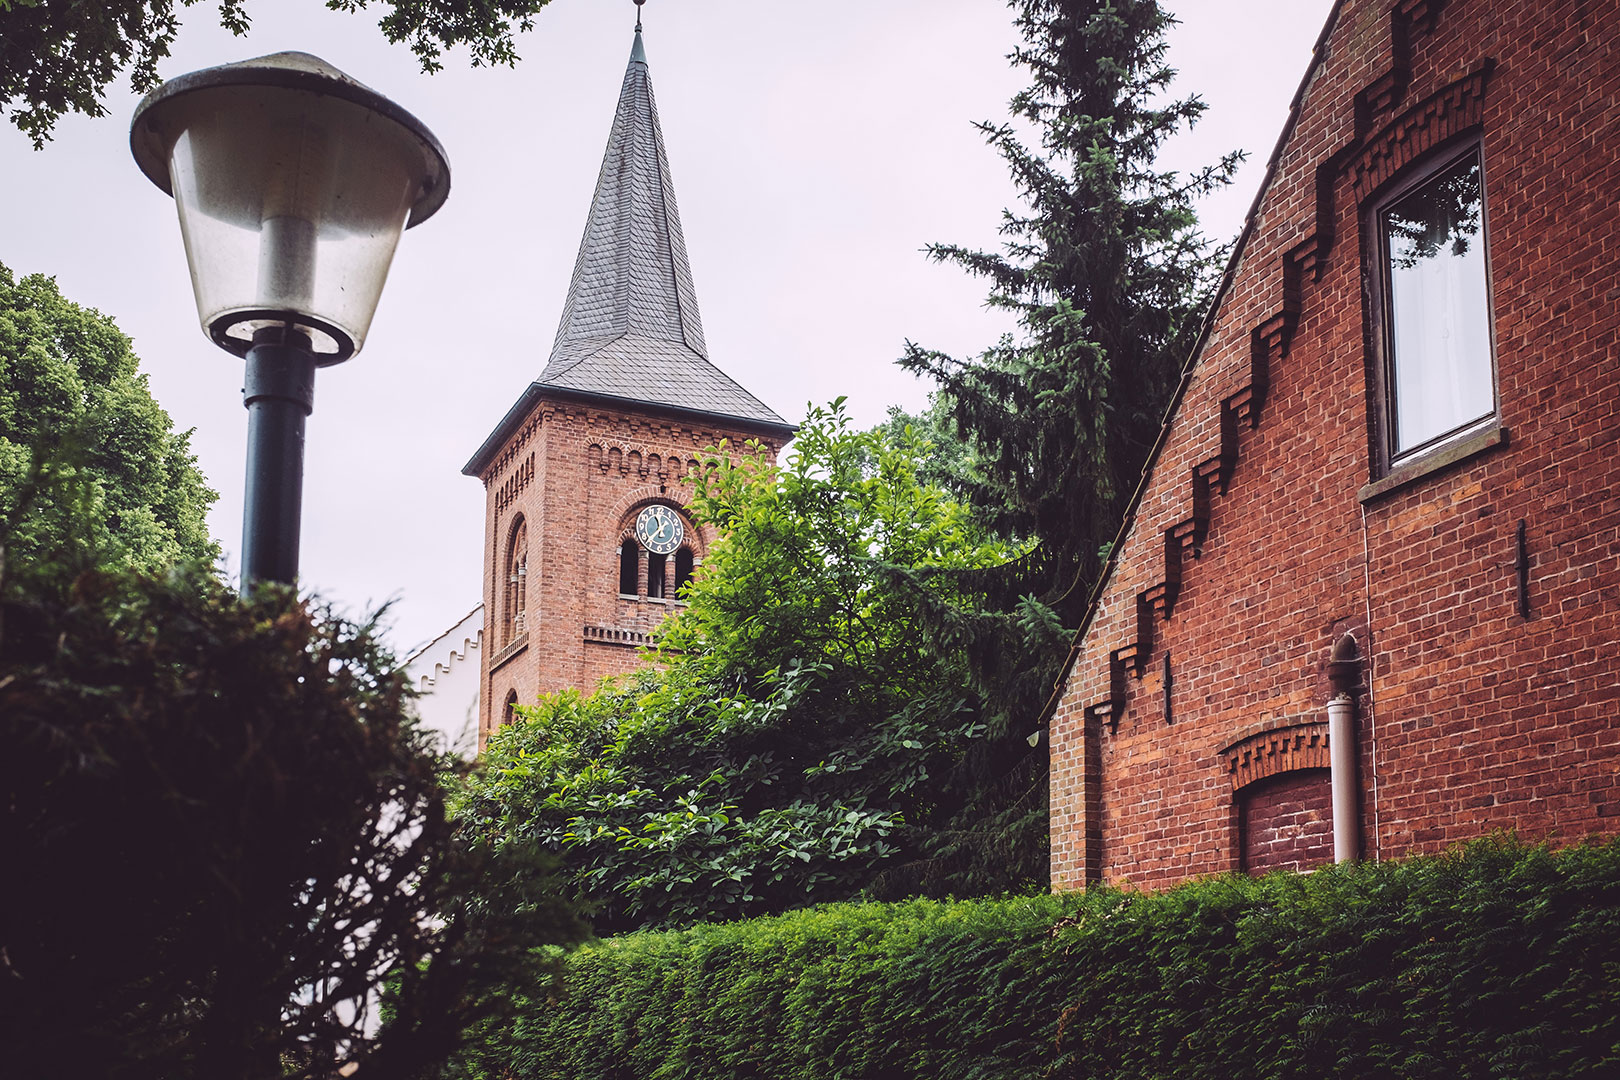 Kirche in Fischerhude (Verden, Niedersachsen)